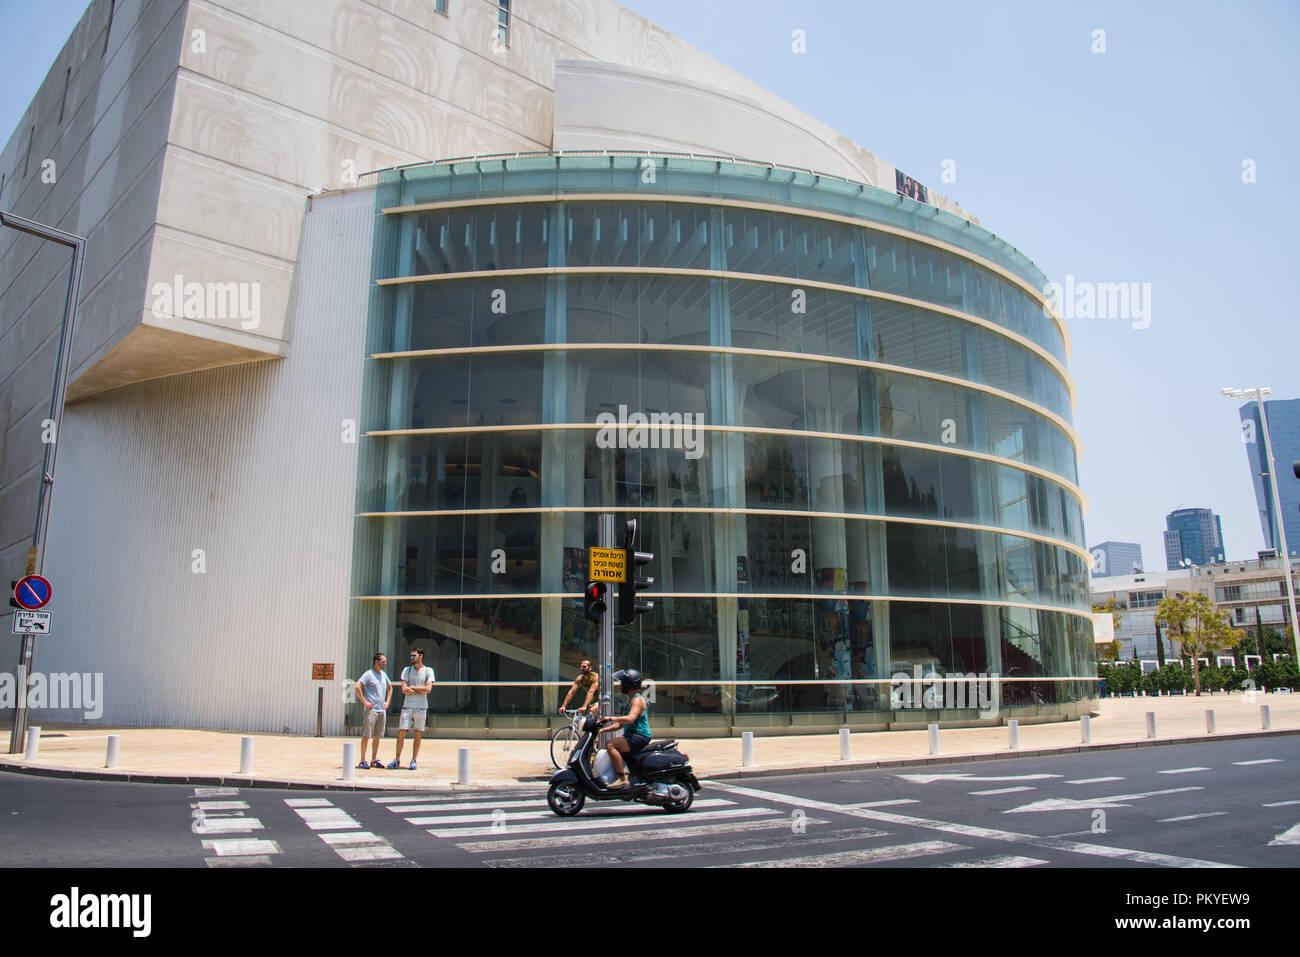 Habima Theater, Tel Aviv, Israel - 1 - Stock Image